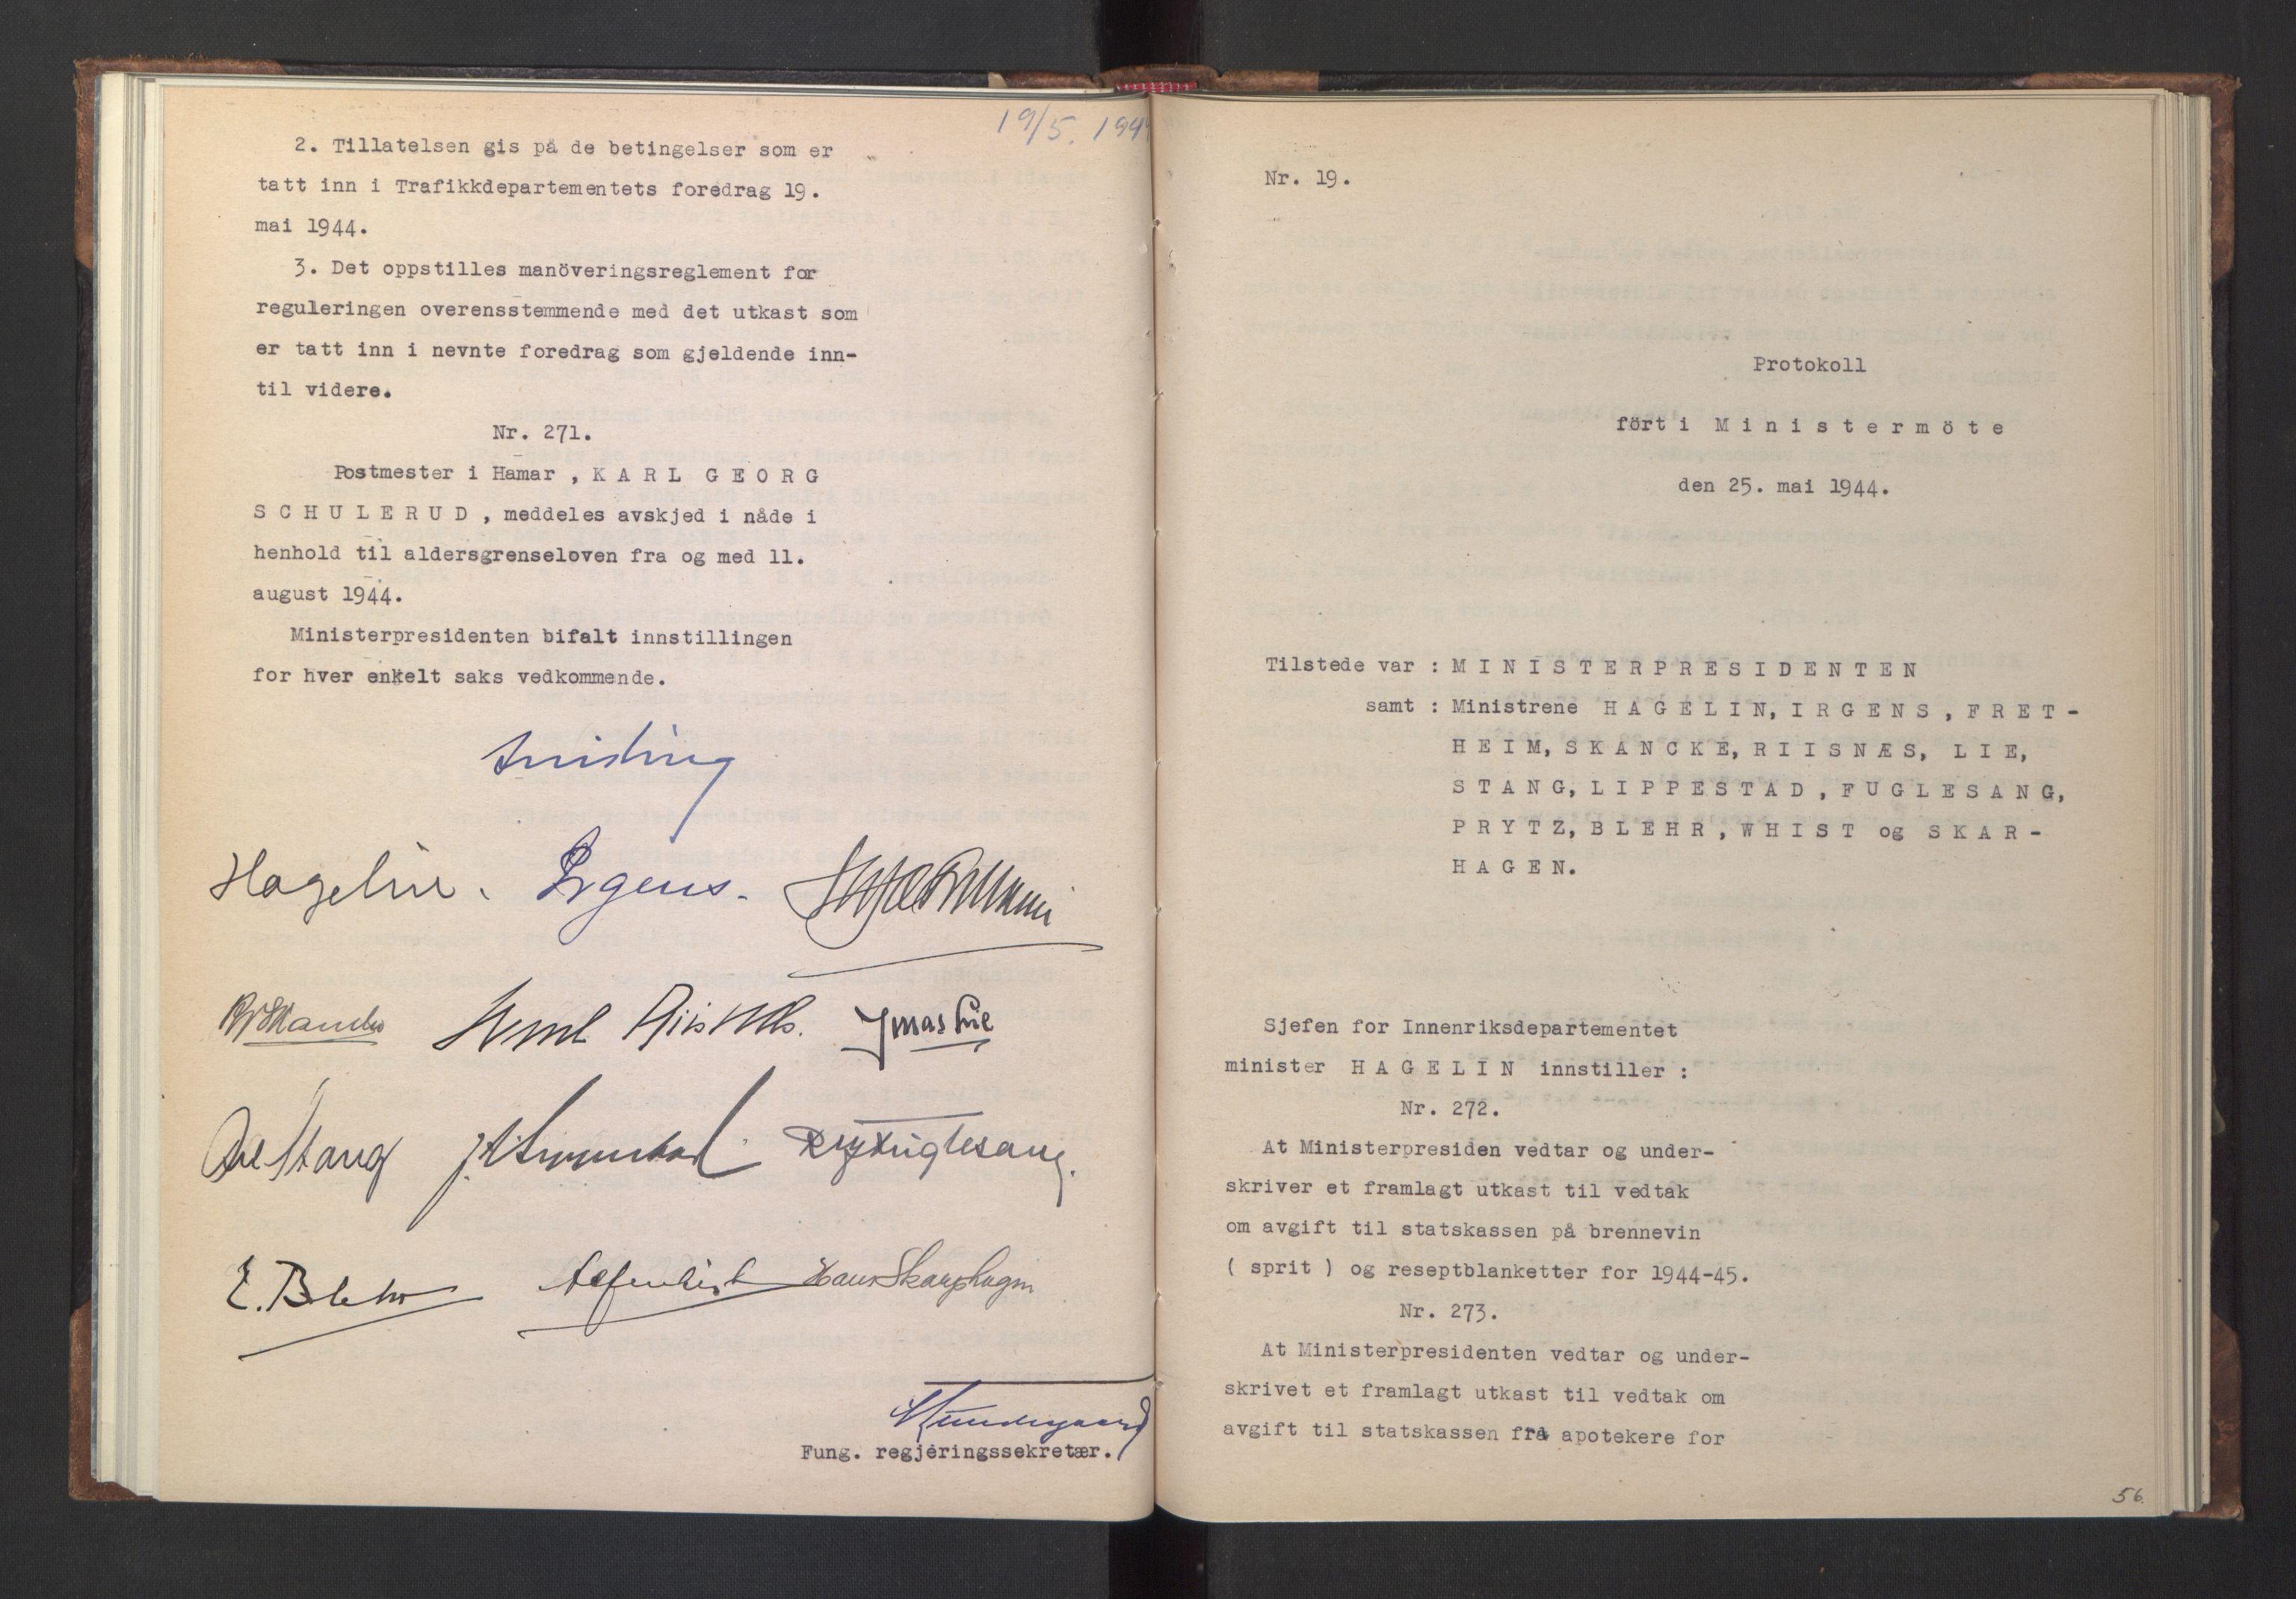 RA, NS-administrasjonen 1940-1945 (Statsrådsekretariatet, de kommisariske statsråder mm), D/Da/L0005: Protokoll fra ministermøter, 1944, s. 55b-56a